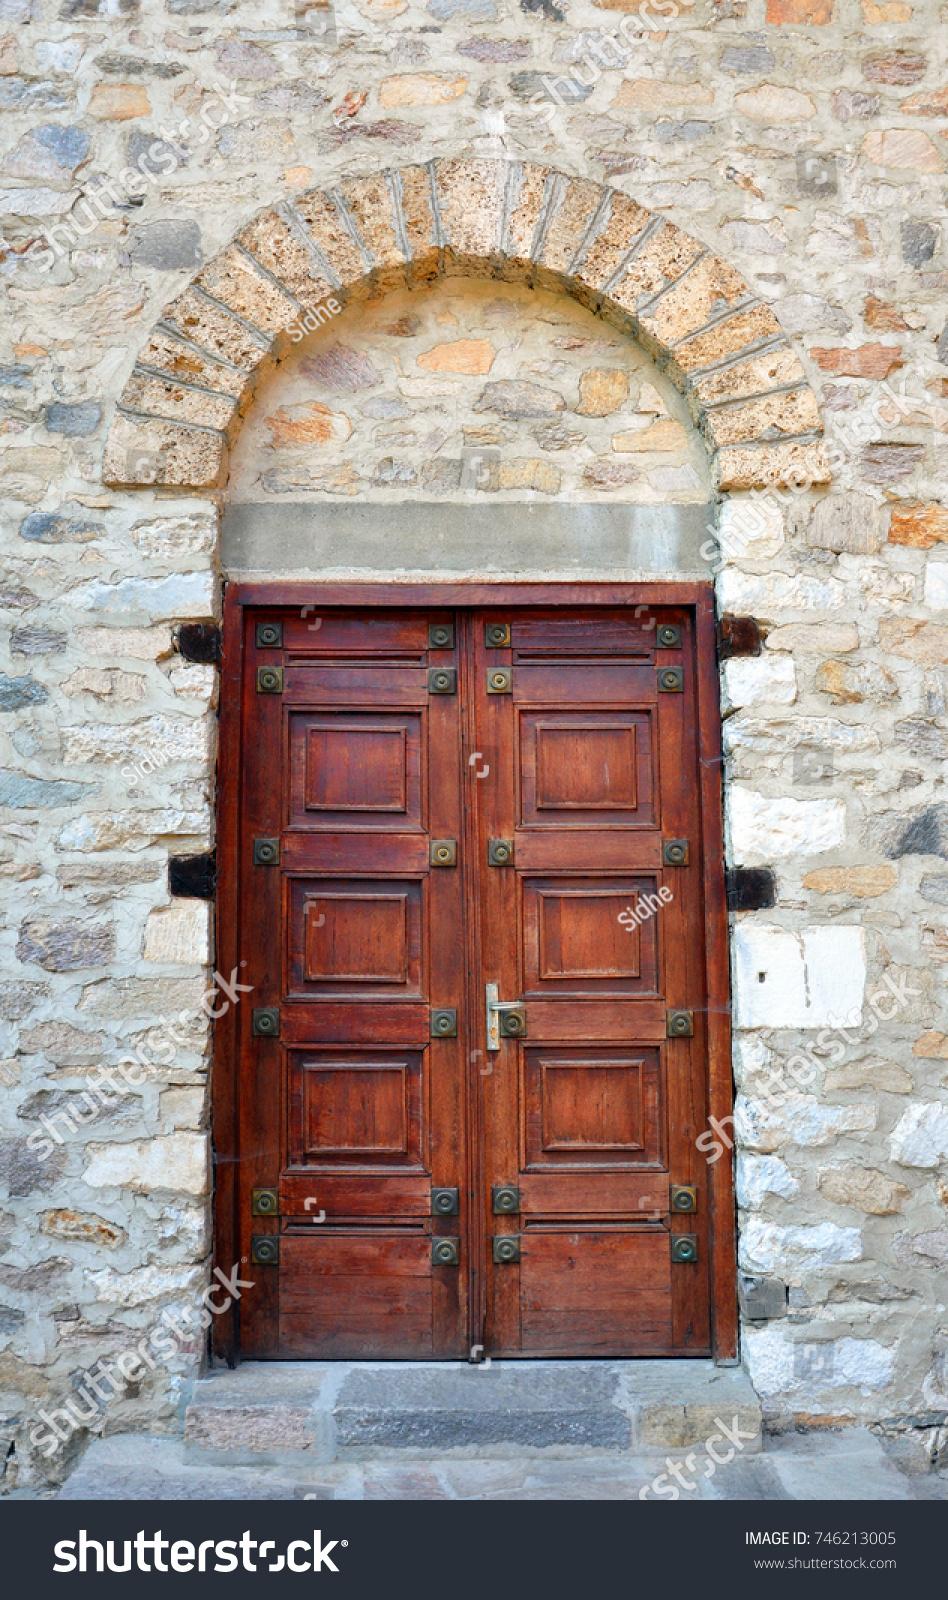 Old Wooden Door Set In Stone Wall With Red Bricks Around It Ez Canvas